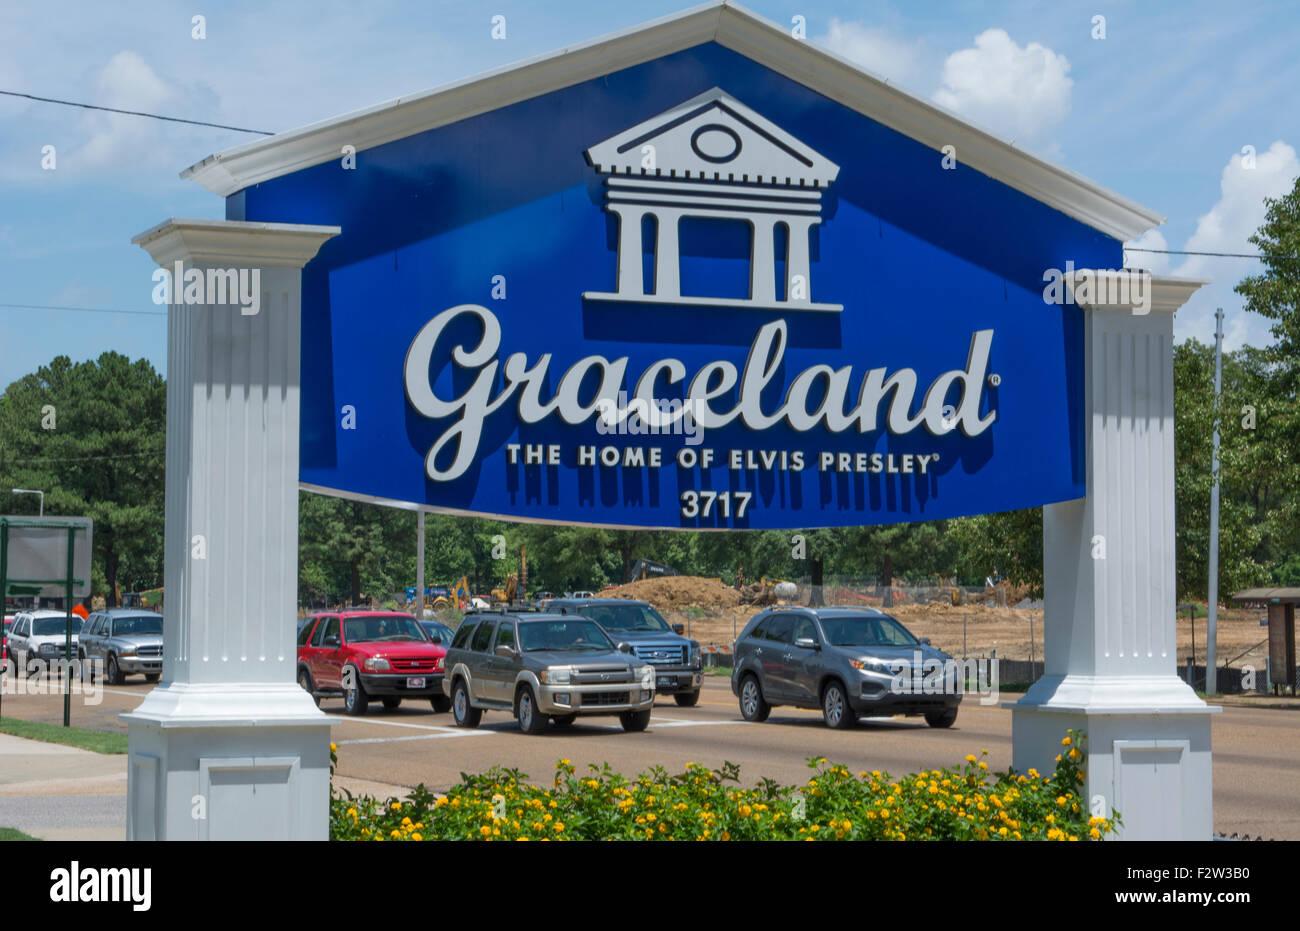 Memphis Tennessee sign for Graceland at Elvis Presley Blvd - Stock Image